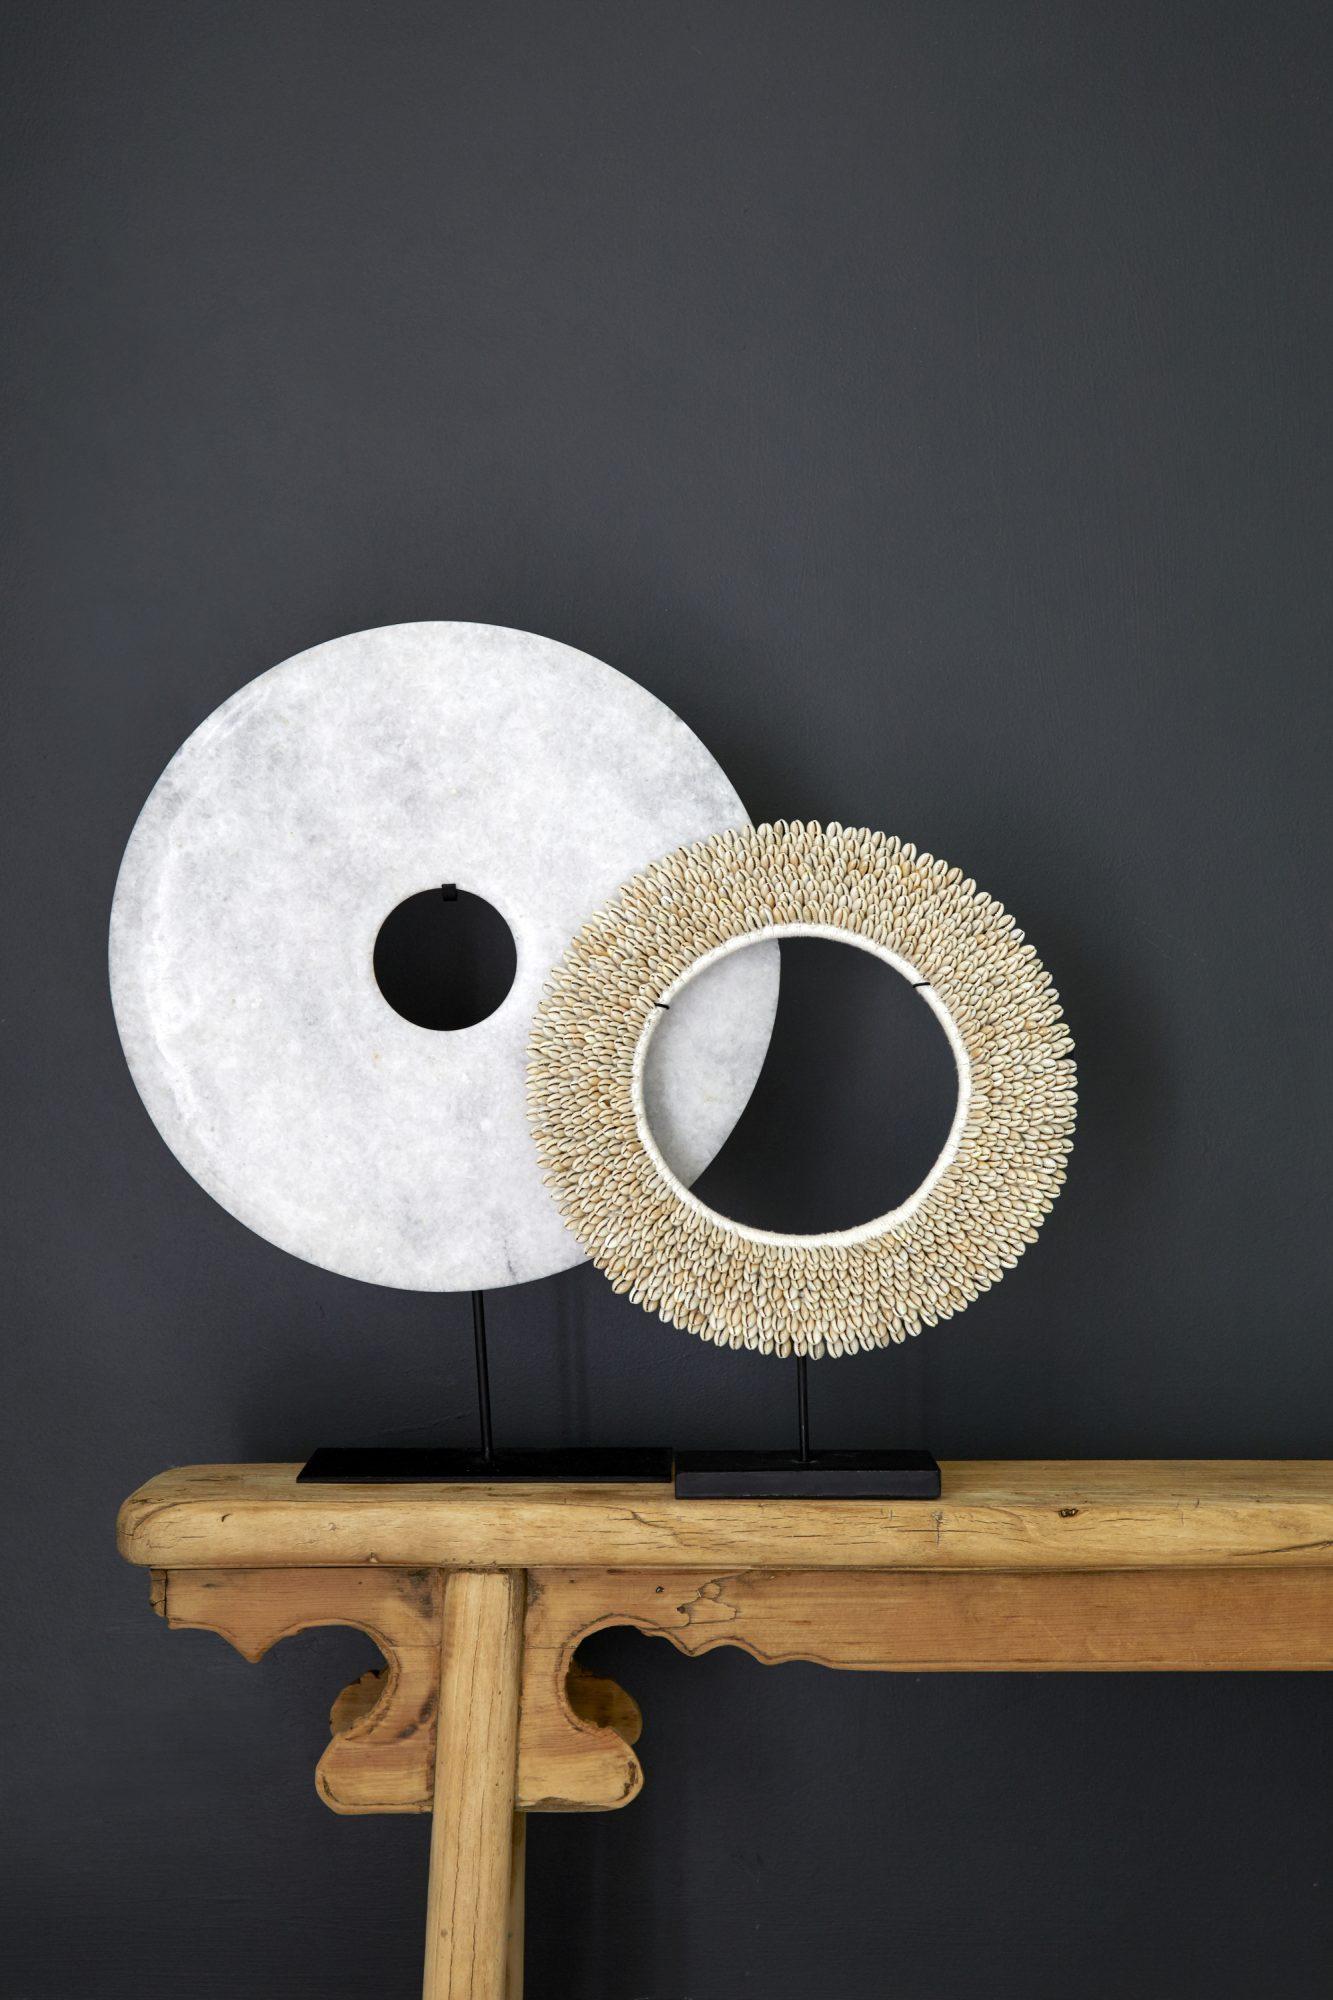 camilla bellord interiors Roundel-and-Necklace Portfolio